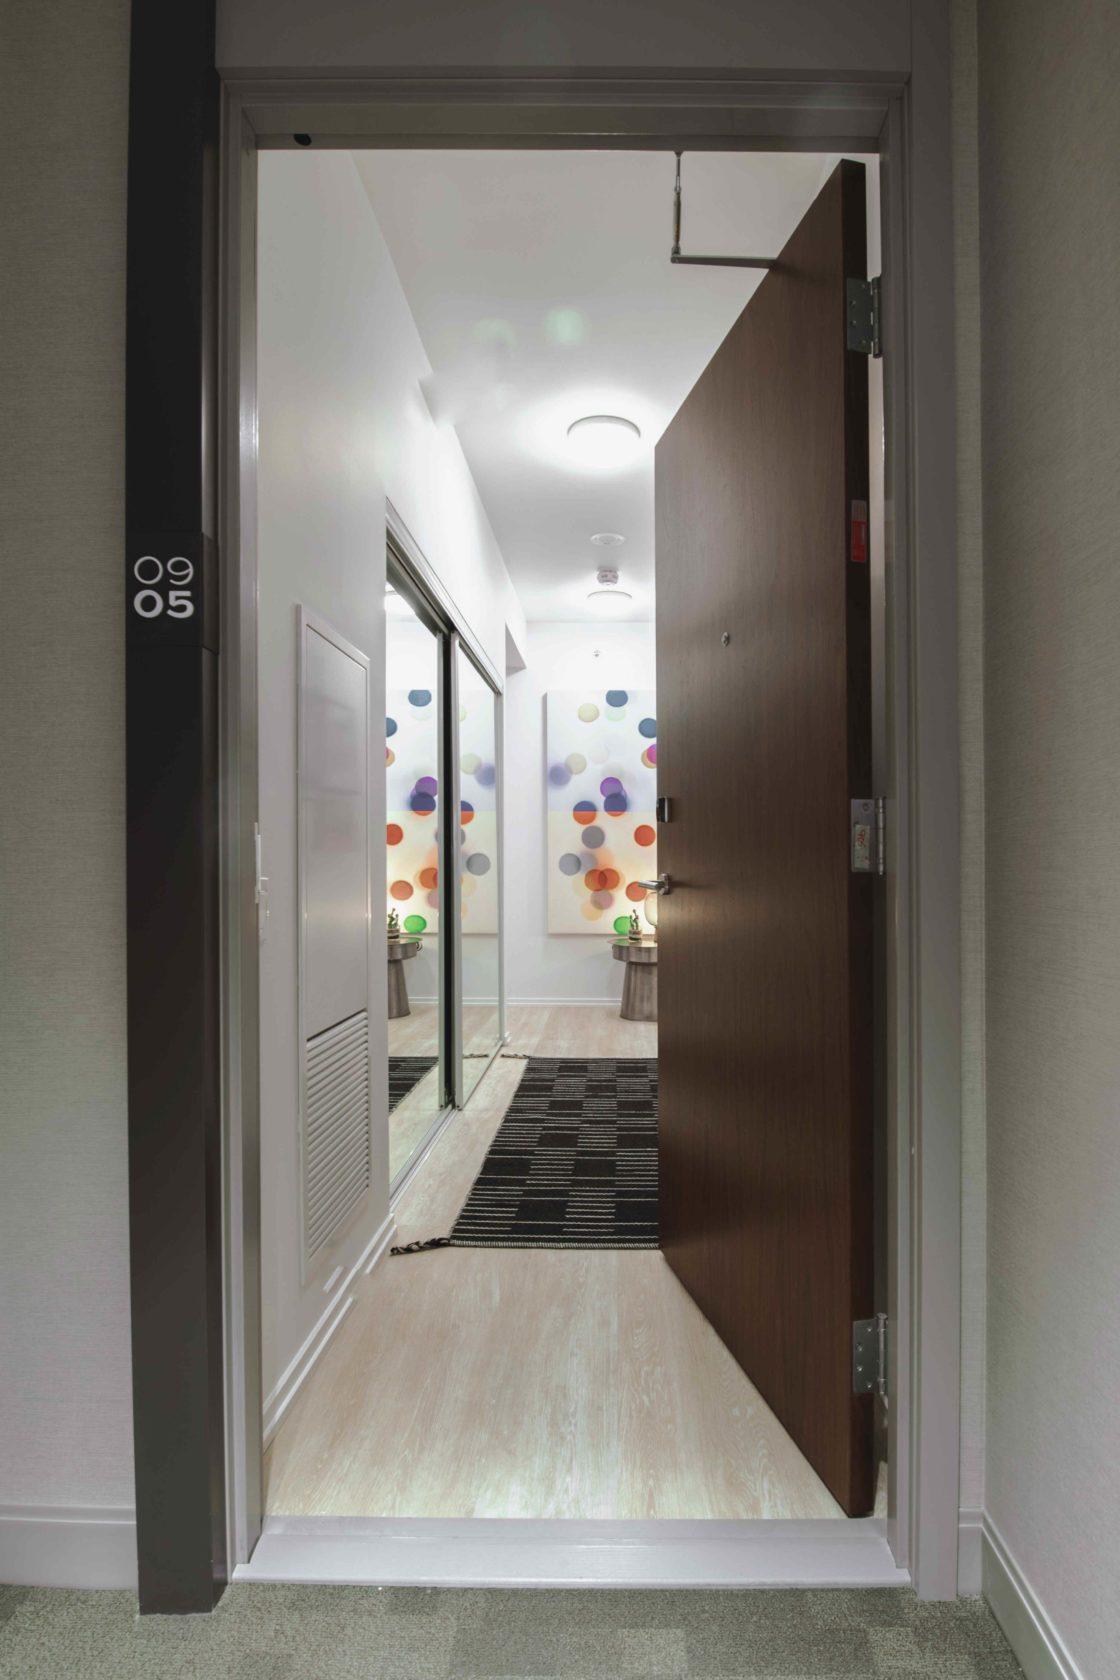 Livmore Suite apartment unit front door